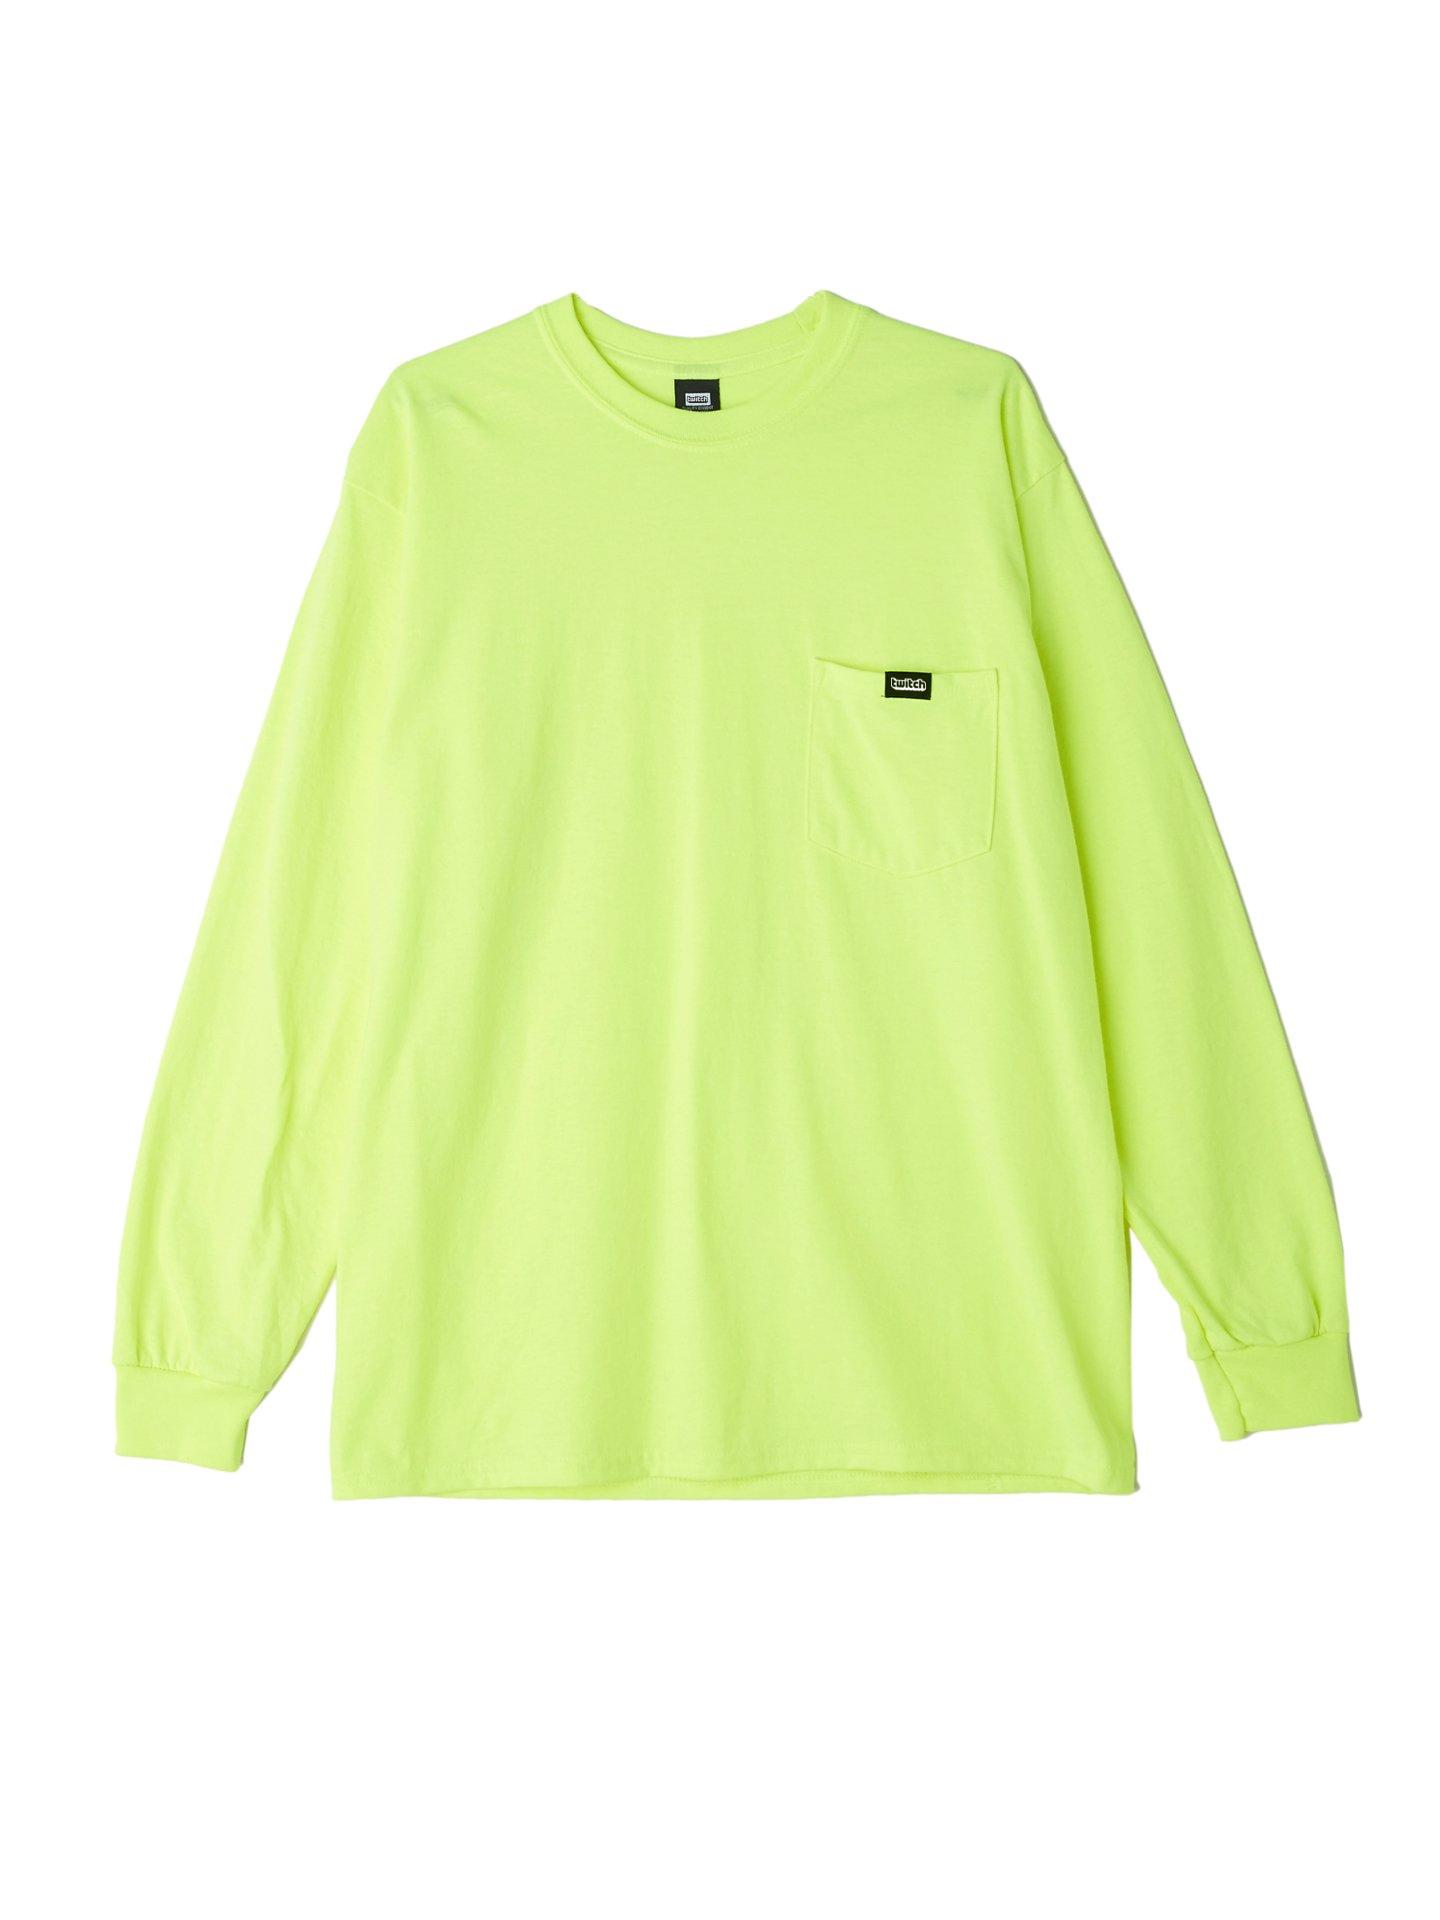 LsPocketShirt2.jpg